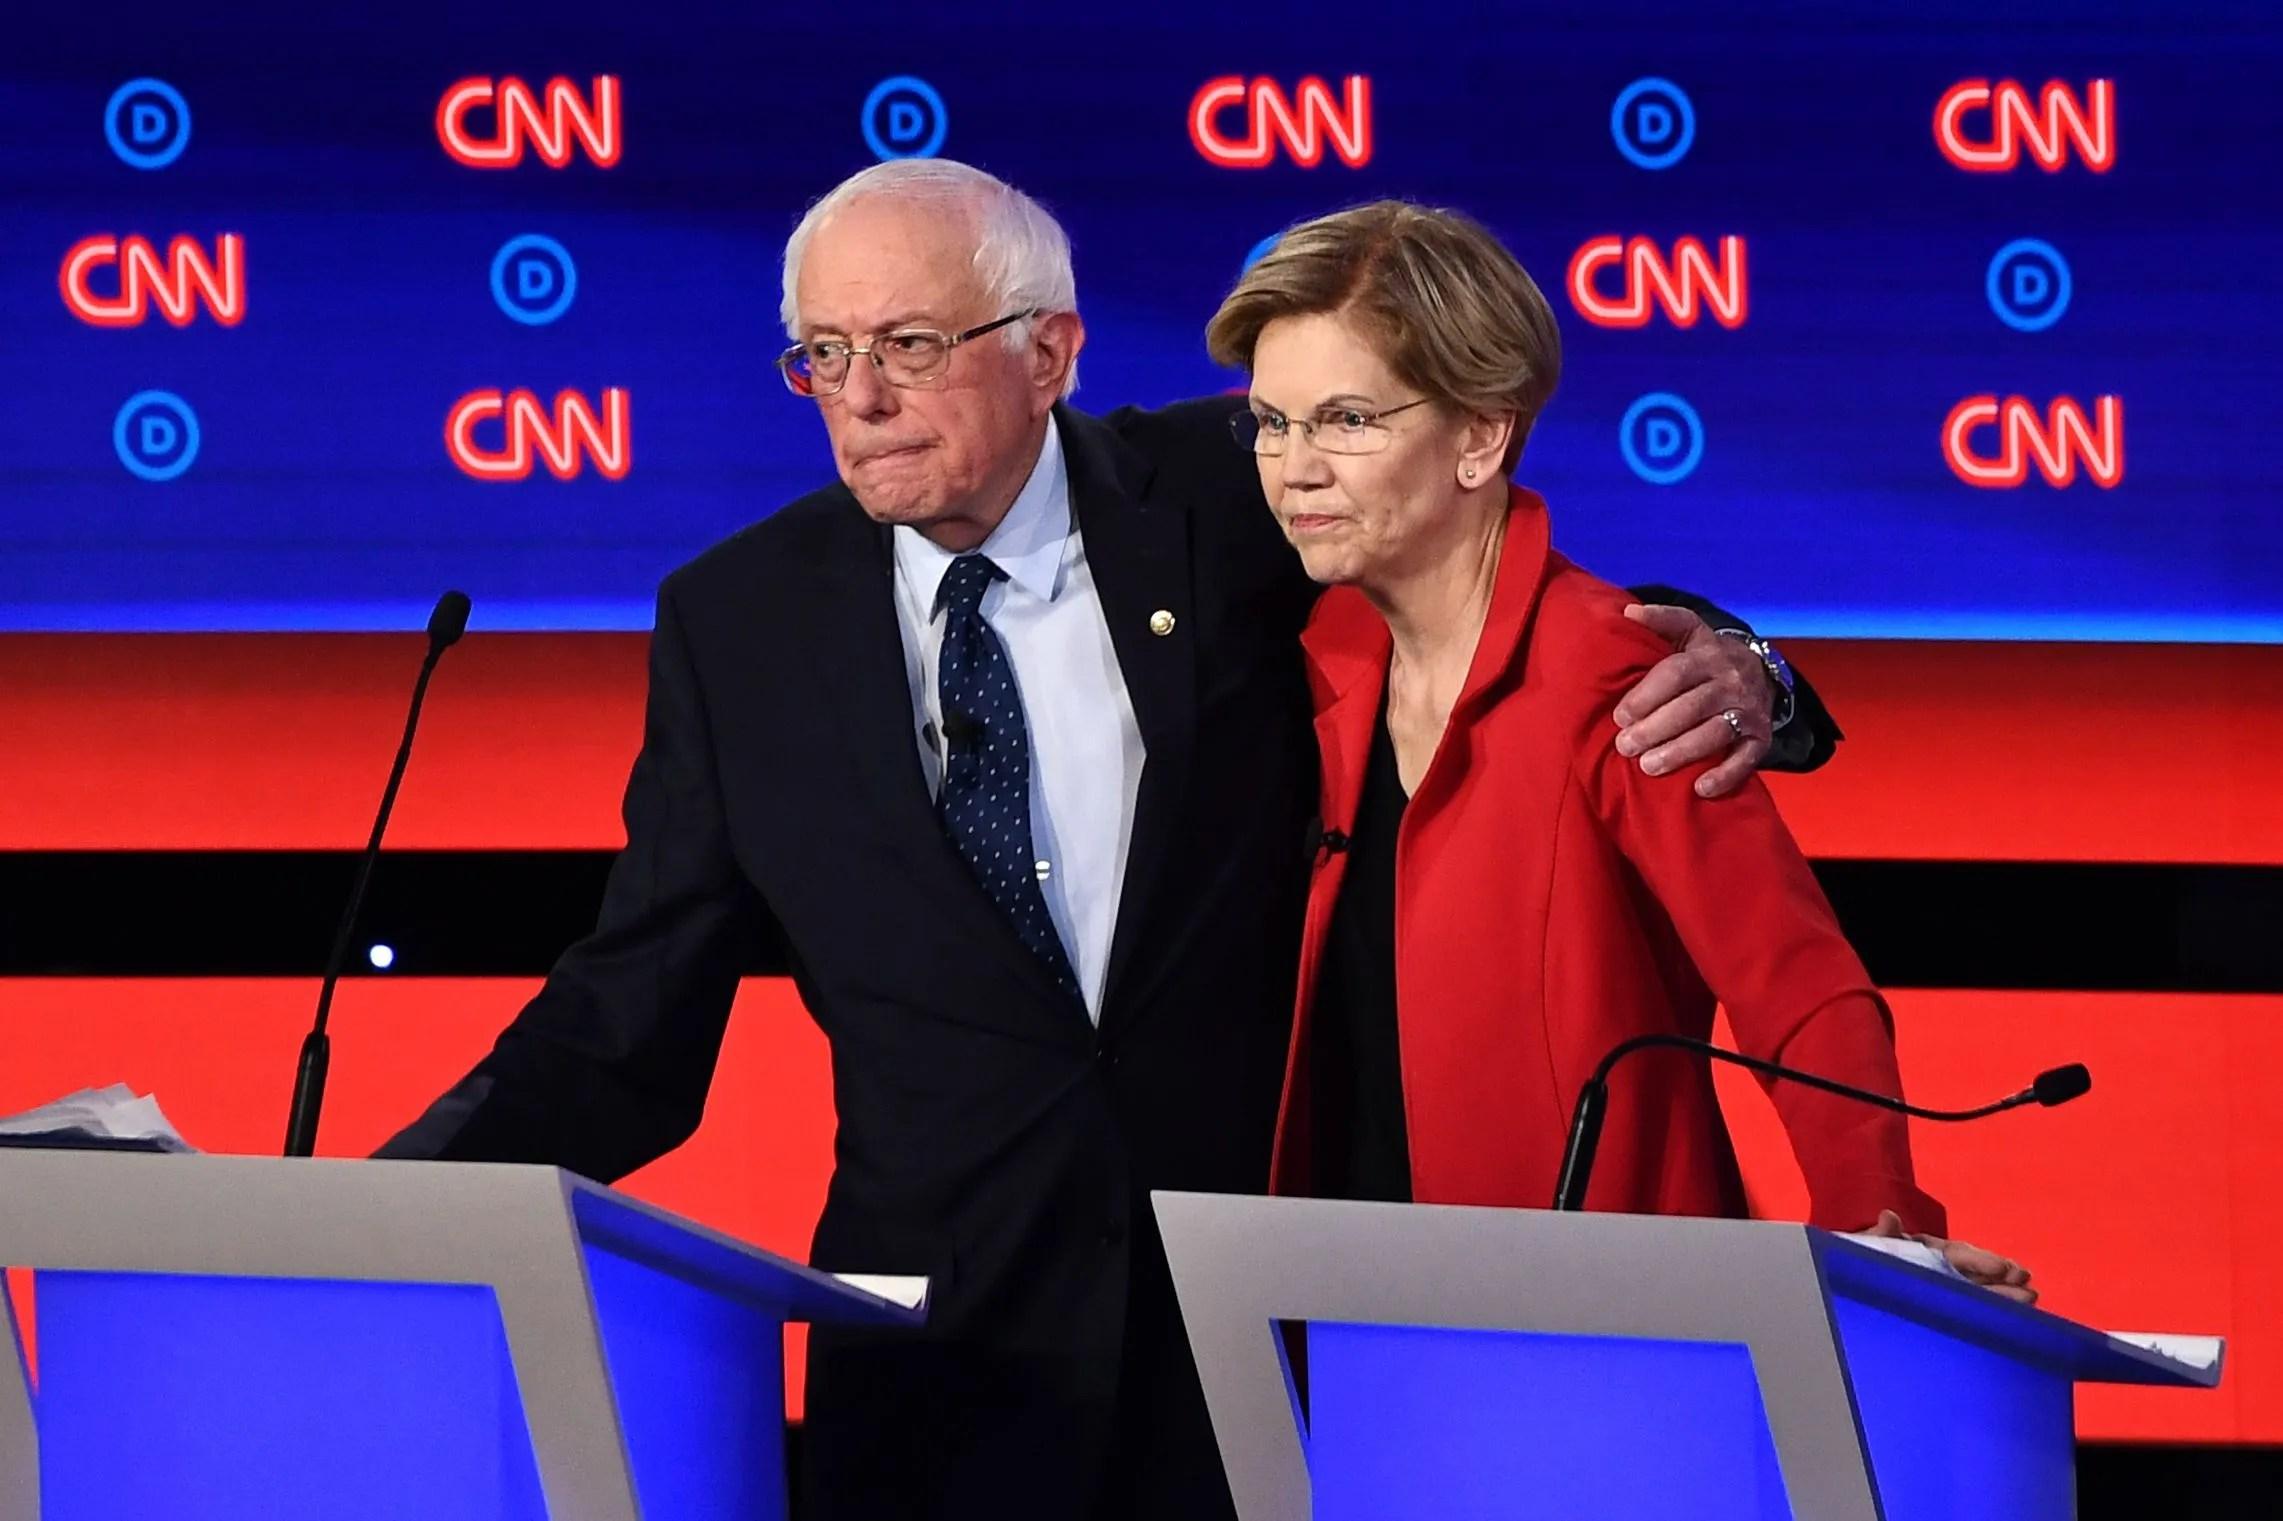 democratic debate winners and